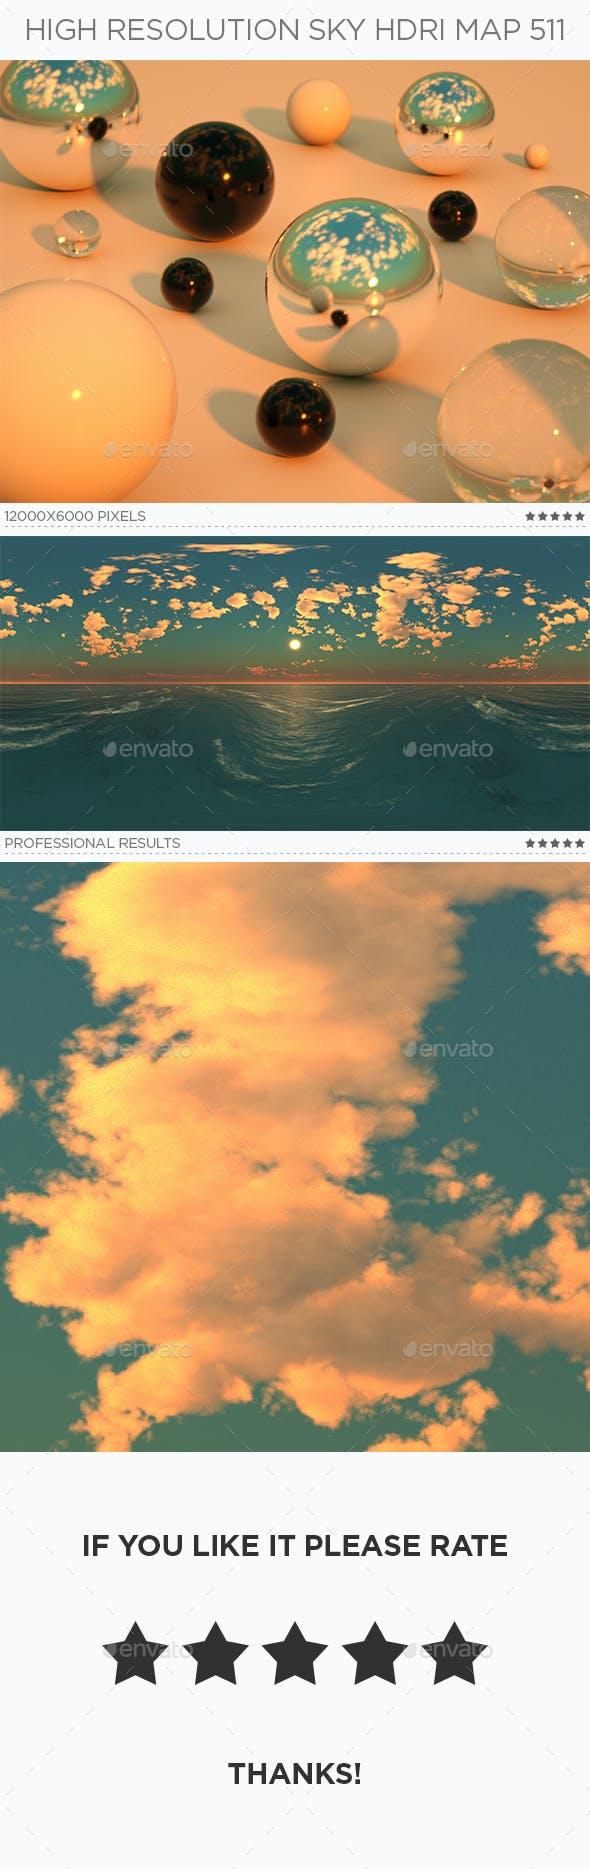 High Resolution Sky HDRi Map 511 - 3DOcean Item for Sale